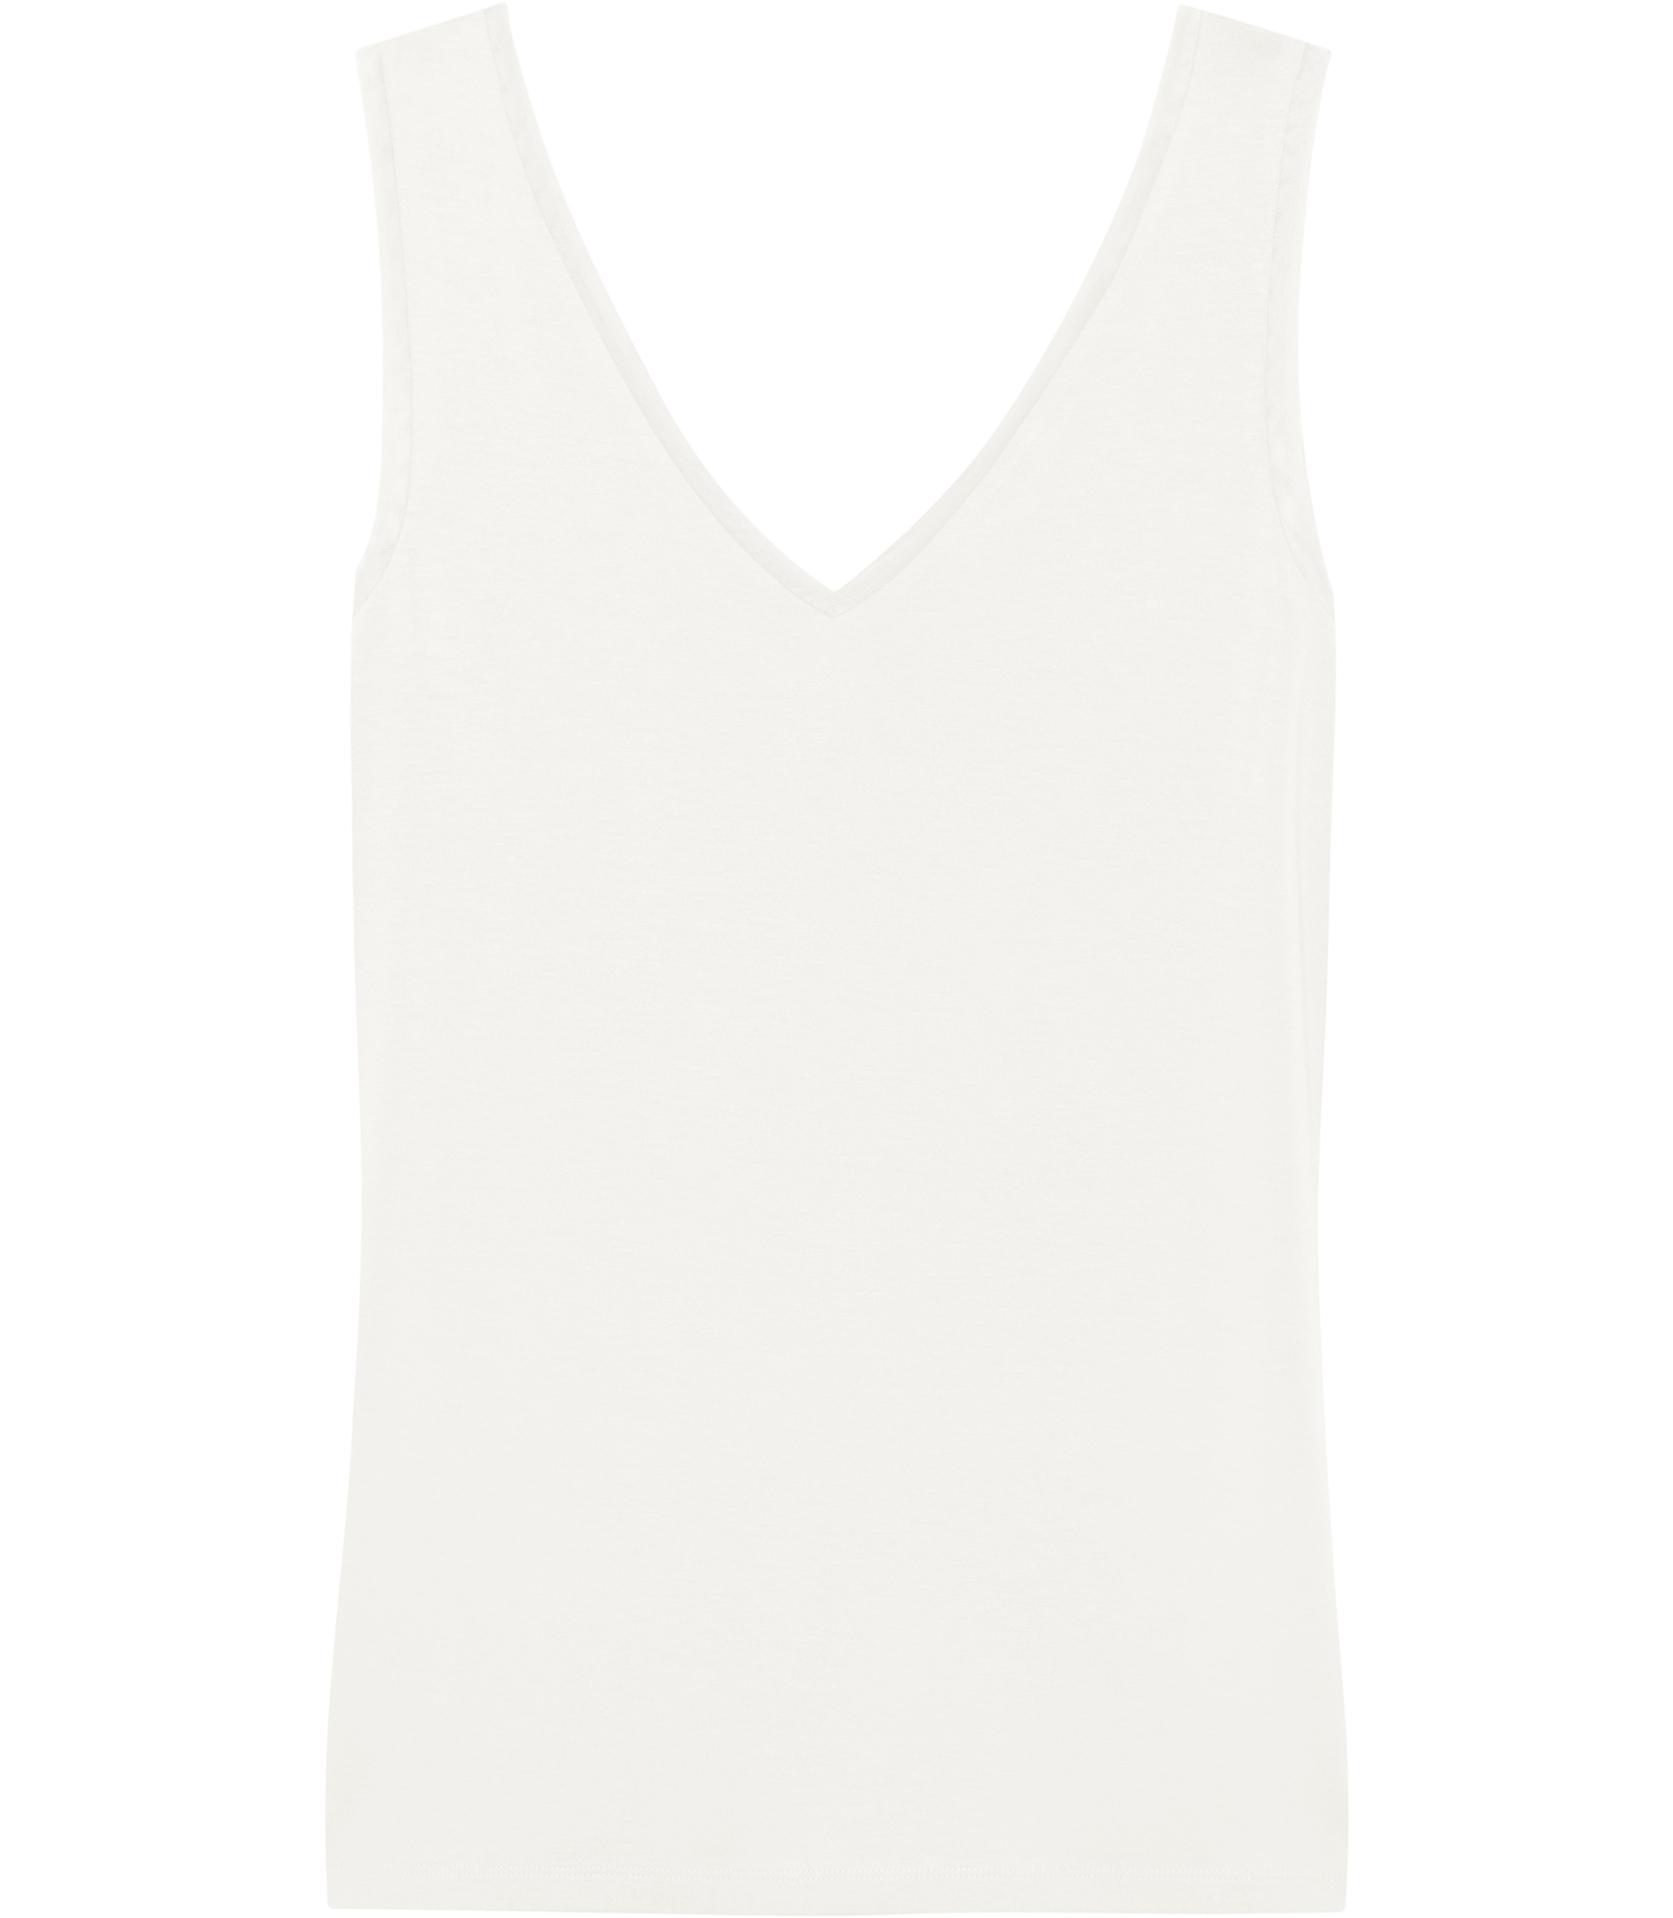 212dcc38e6676 Lyst - Reiss Ona V-neck Tank Top in White